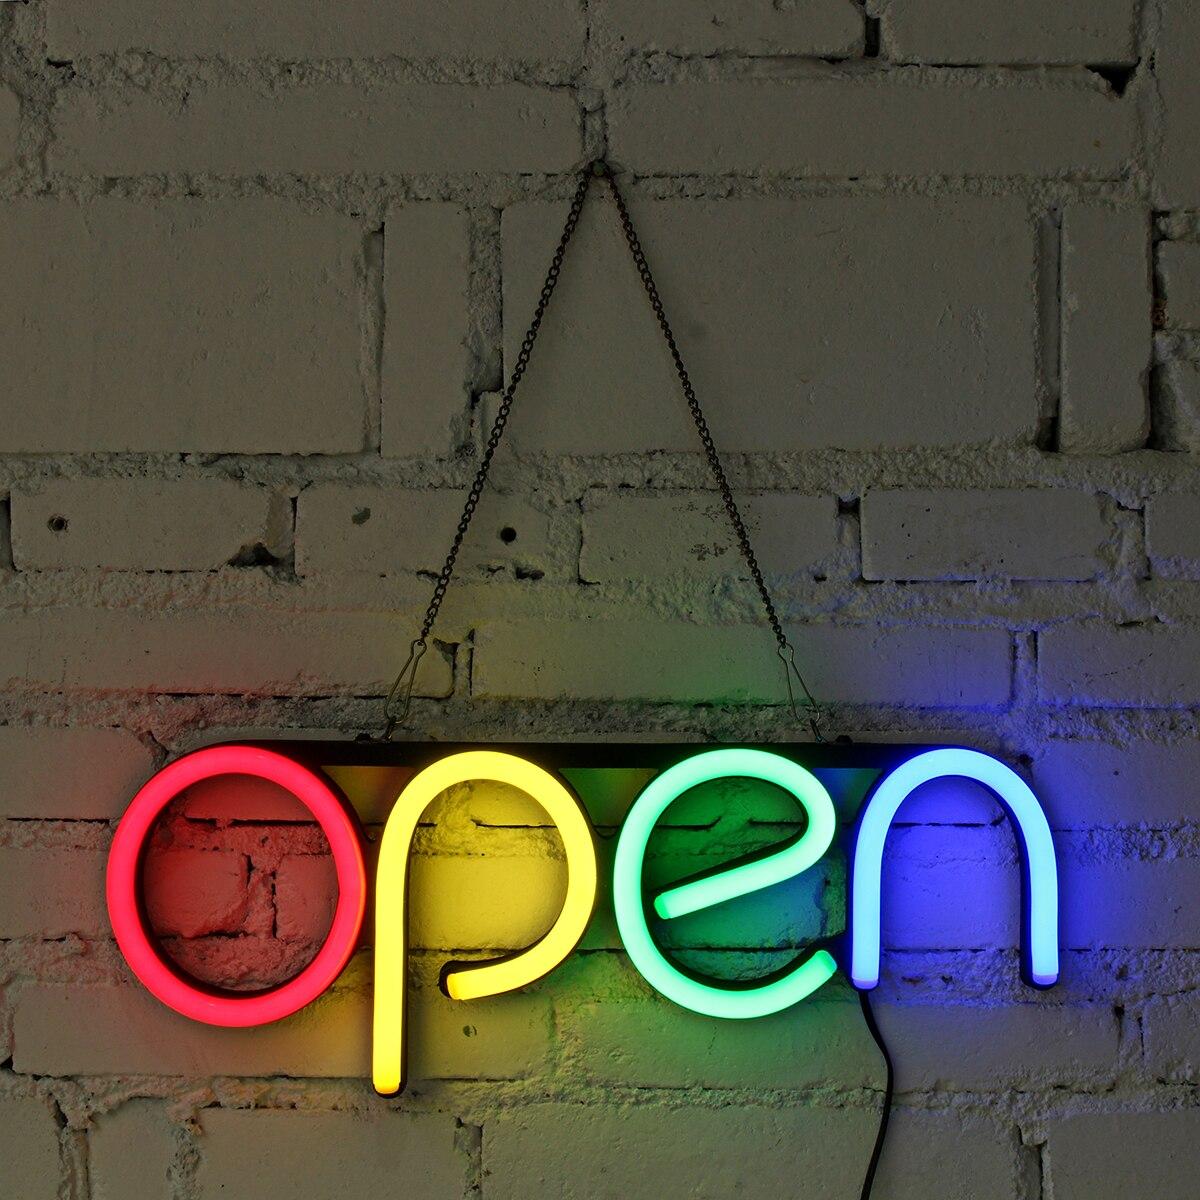 16'' OPEN Neon Sign LED Light Tube Handmade Visual Artwork Bar Club KTV Wall Decoration Commercial Lighting Colorful Neon Bulbs